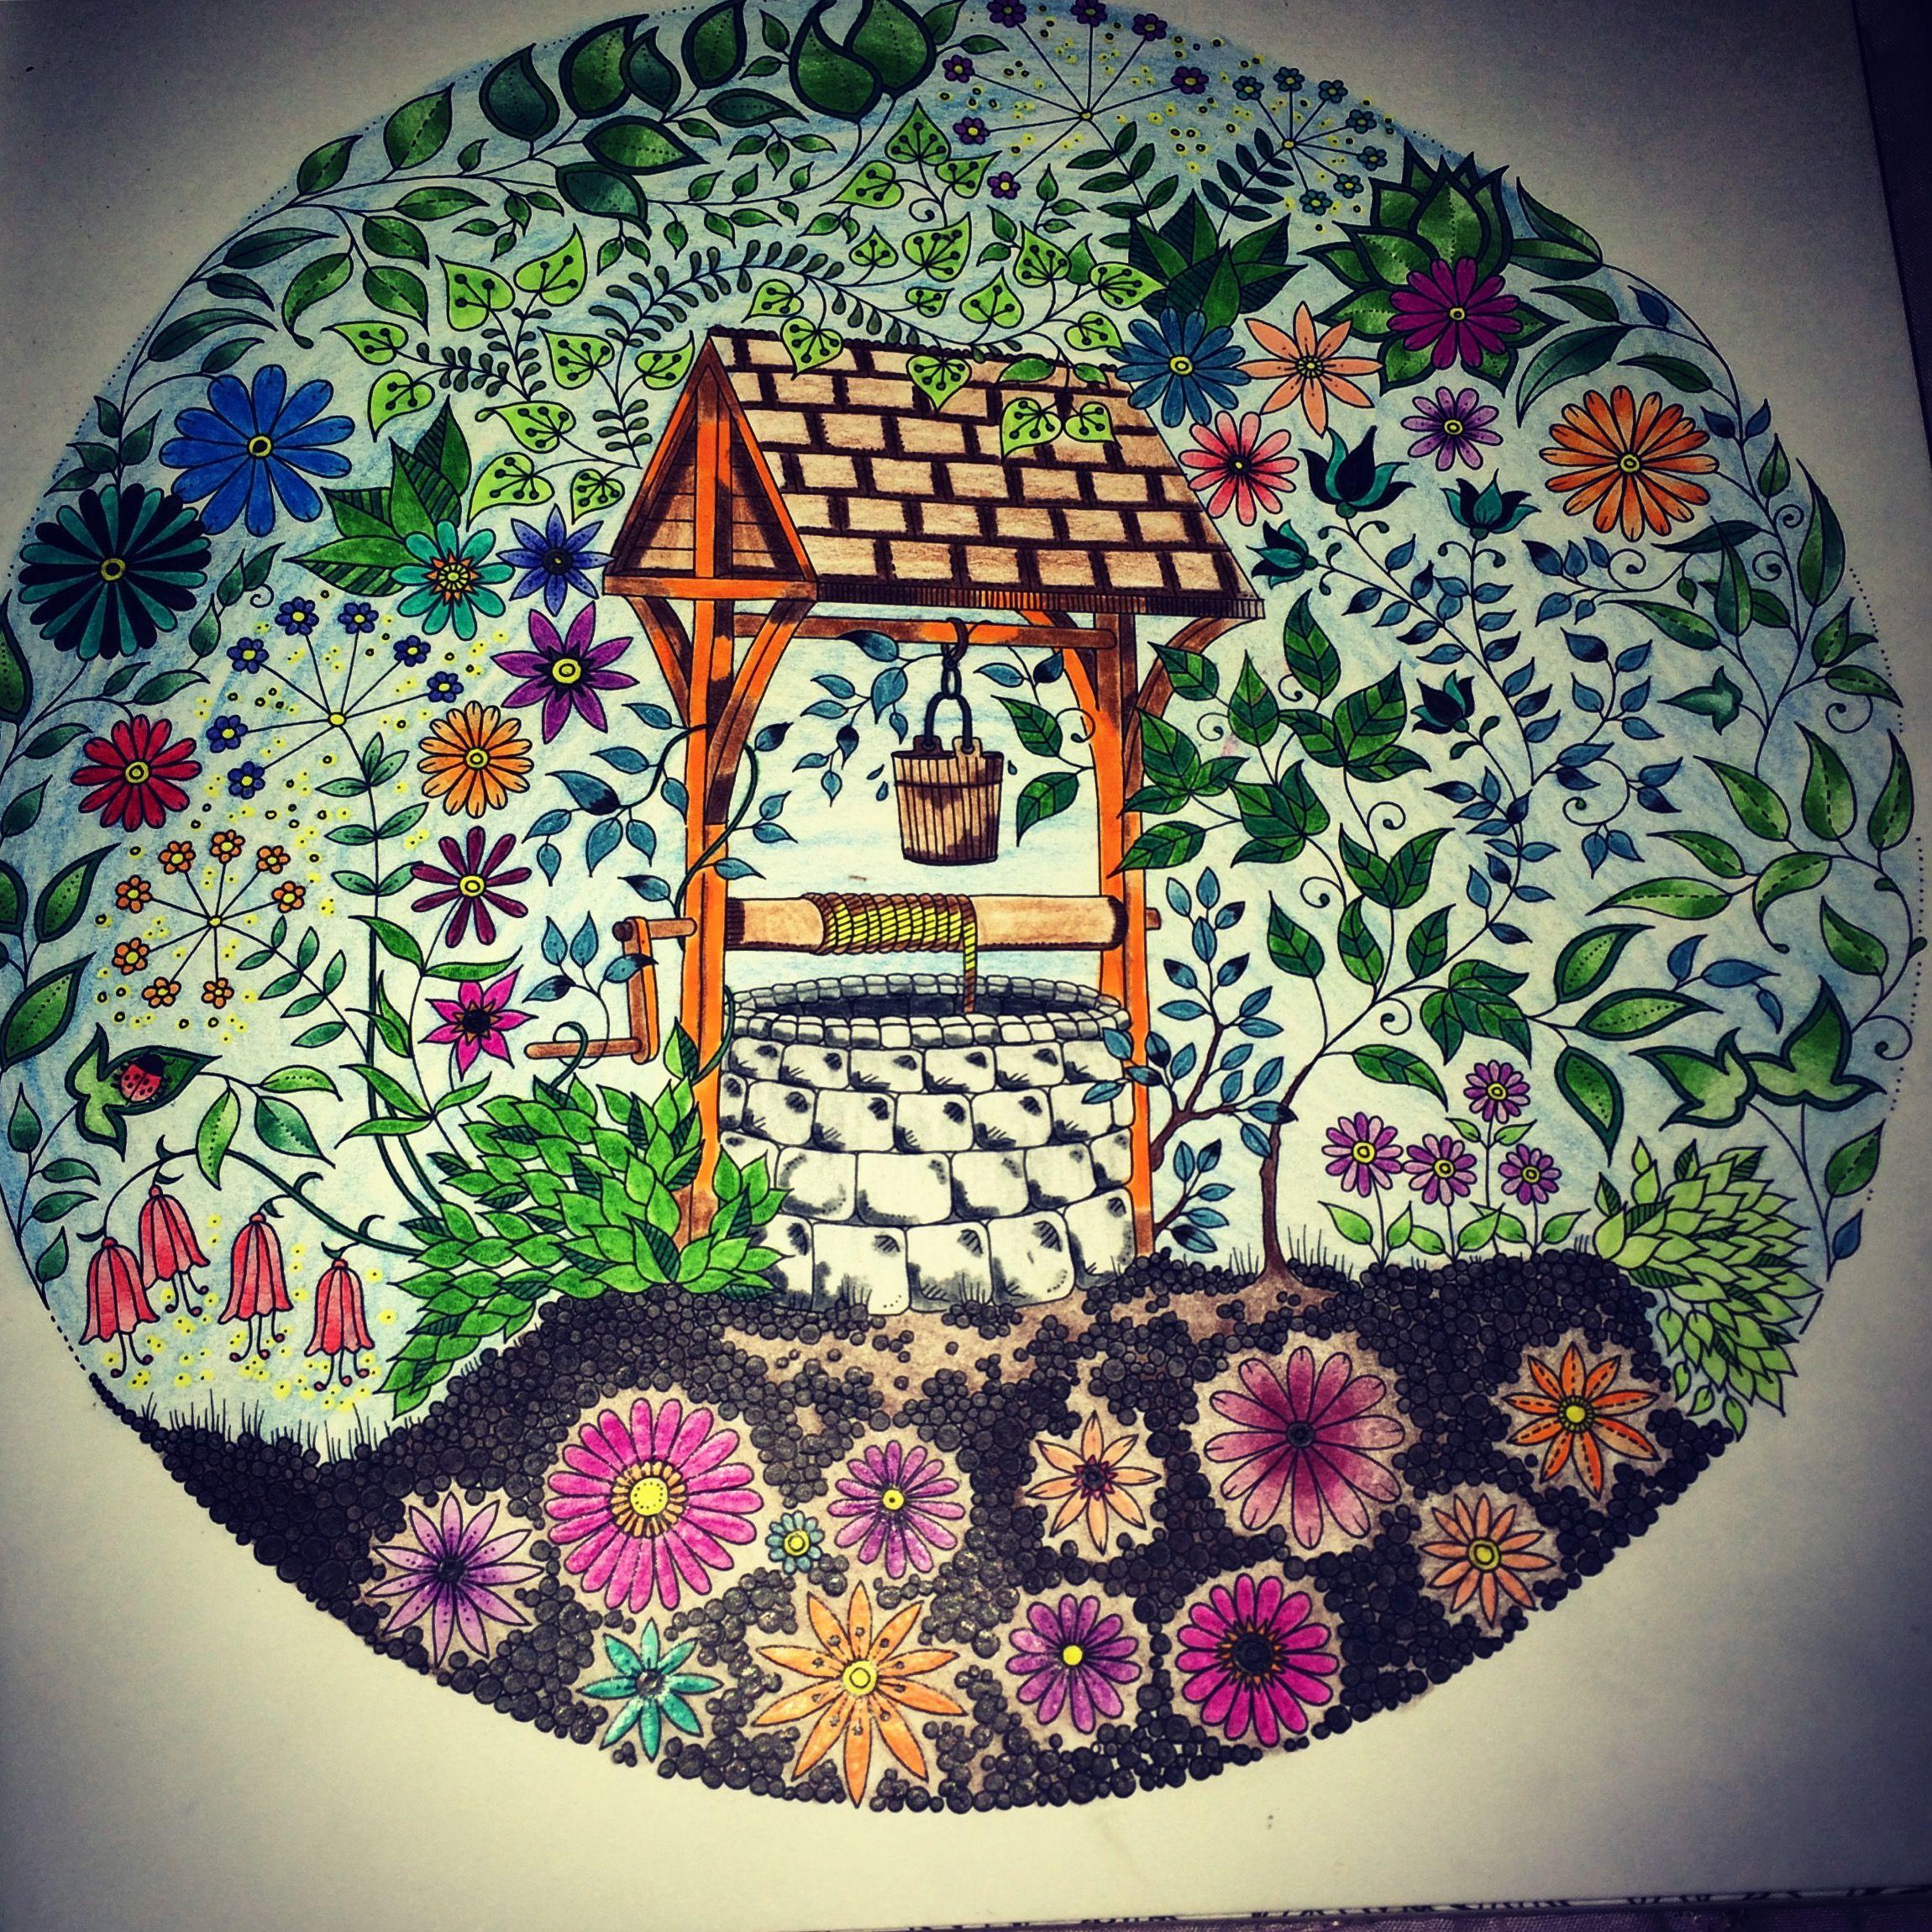 El Jardín Secreto De Johanna Basford Jardines Secretos El Jardin Secreto Libro Libros Para Colorear